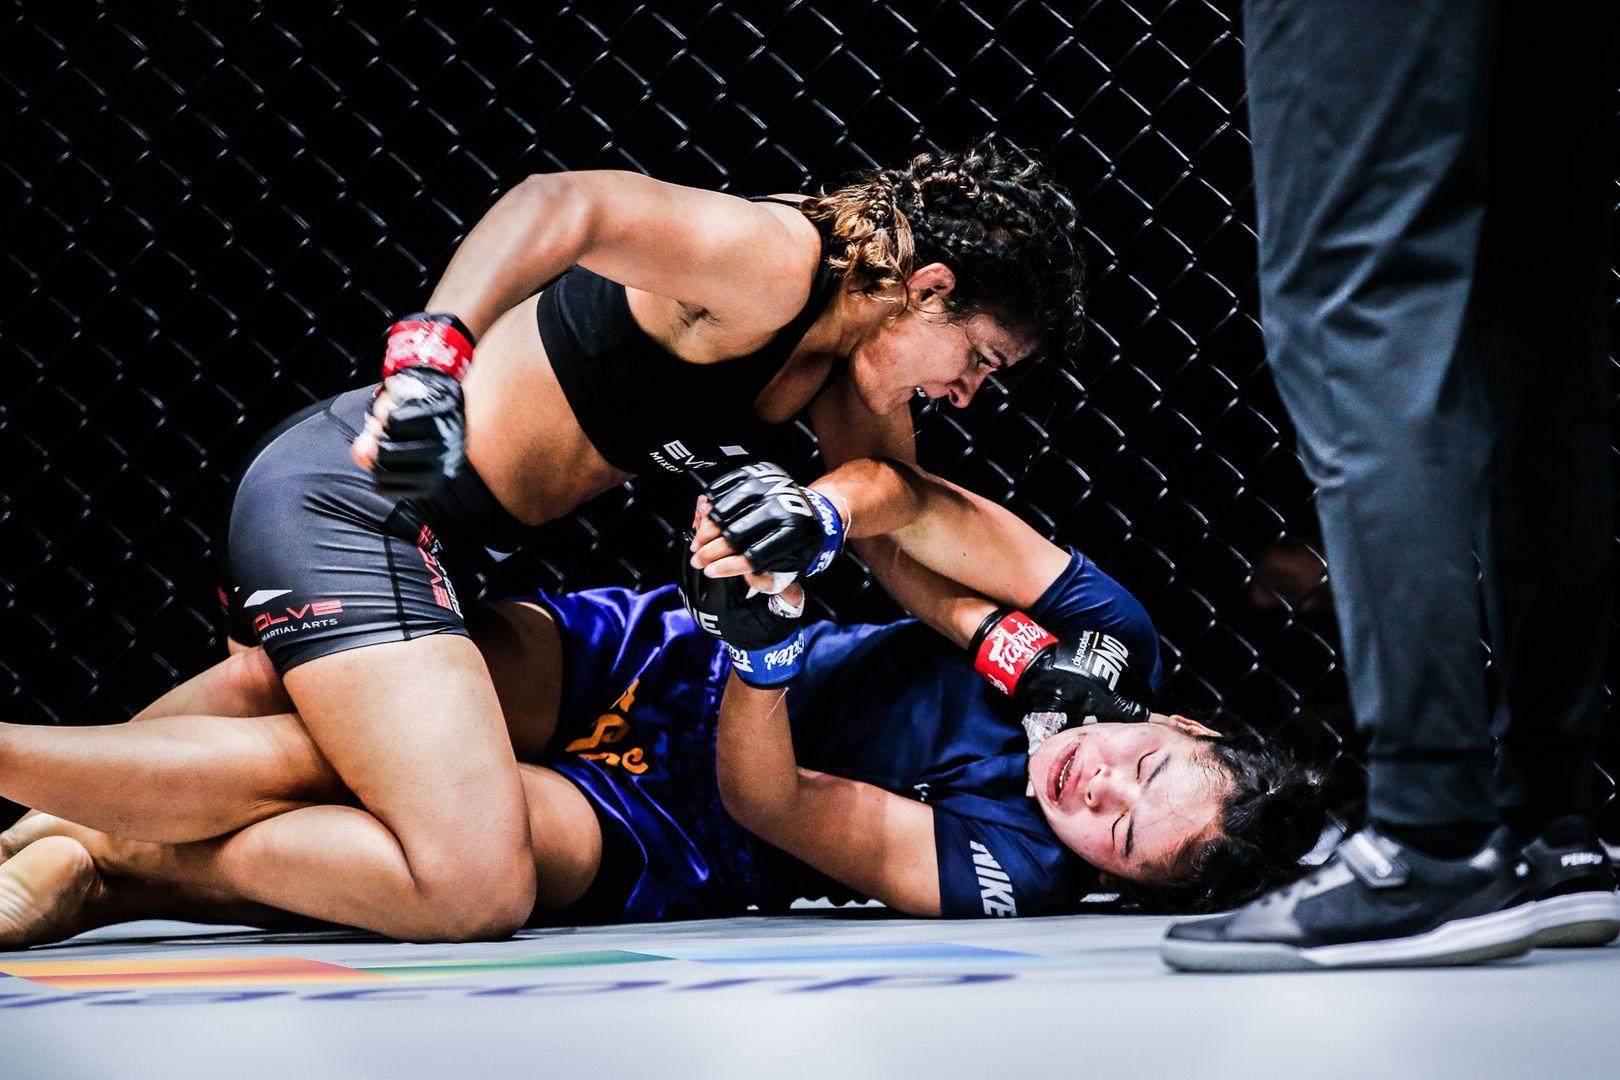 Indian wrestling icon Ritu Phogat unloads ground and pound on Nou Srey Pov